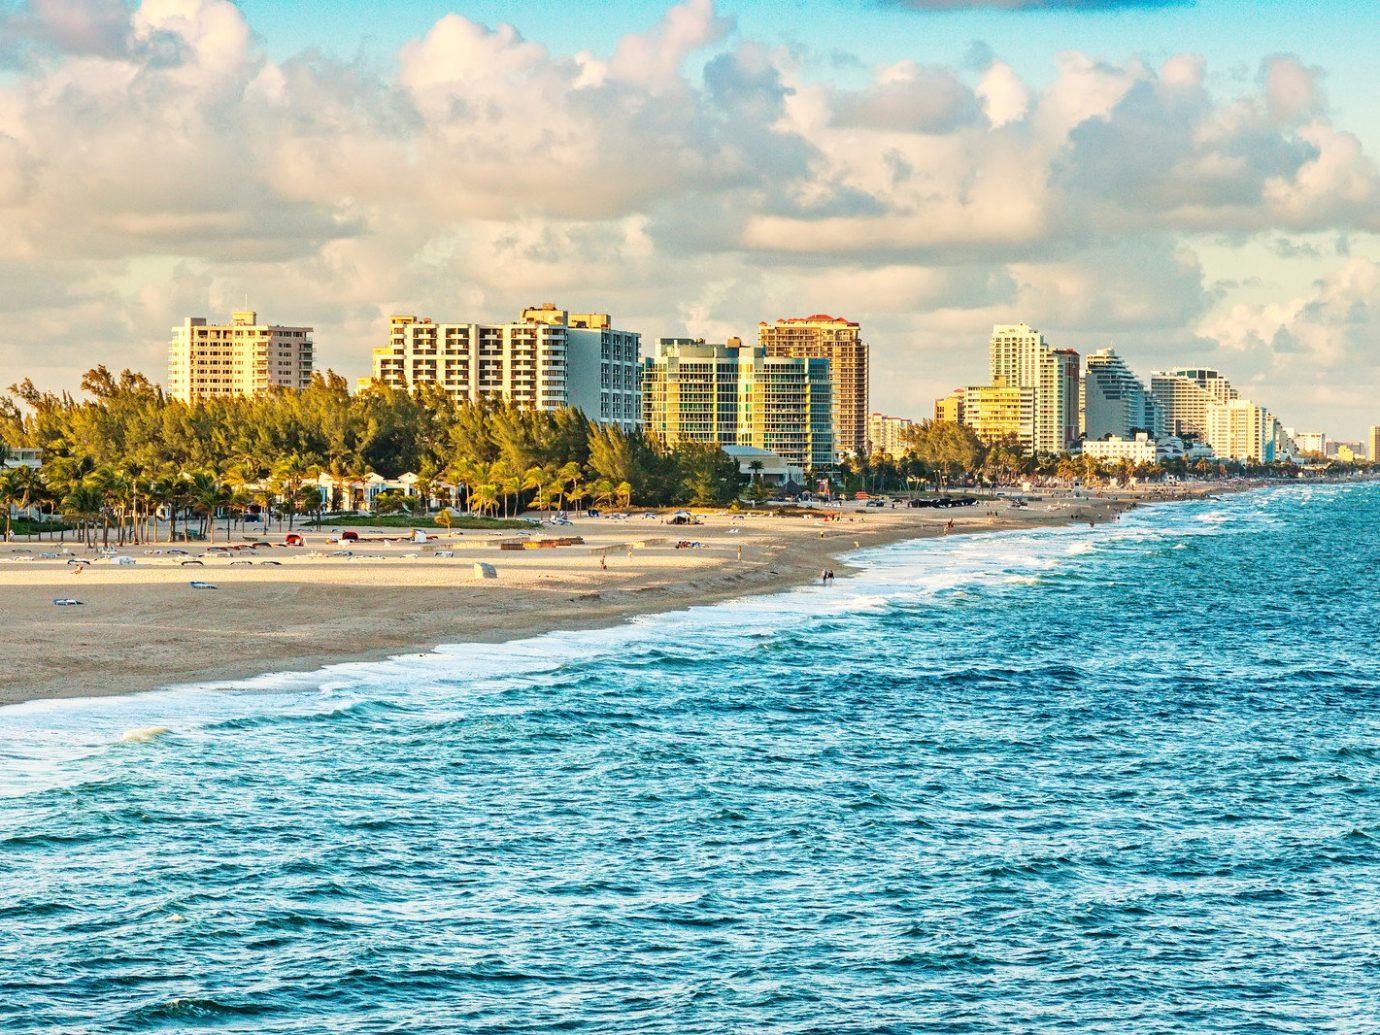 Offbeat Travel Tips sky water outdoor horizon geographical feature Beach Sea City shore Coast skyline Ocean vacation human settlement bay cityscape caribbean wave Harbor